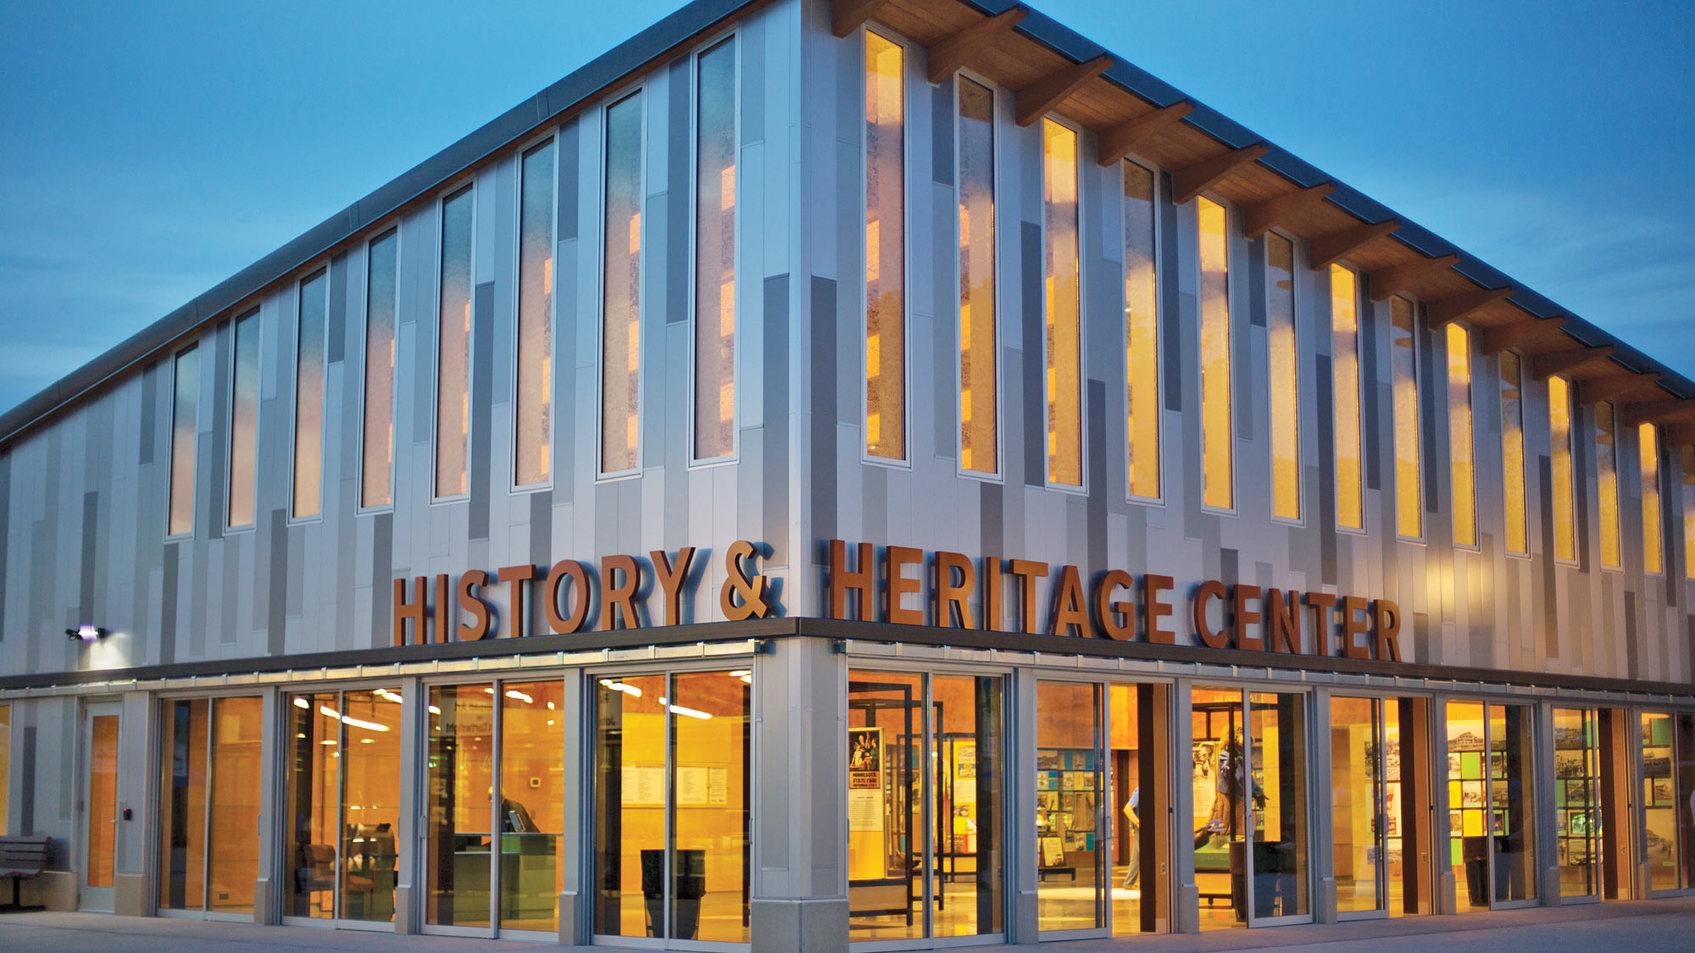 History & Heritage Center